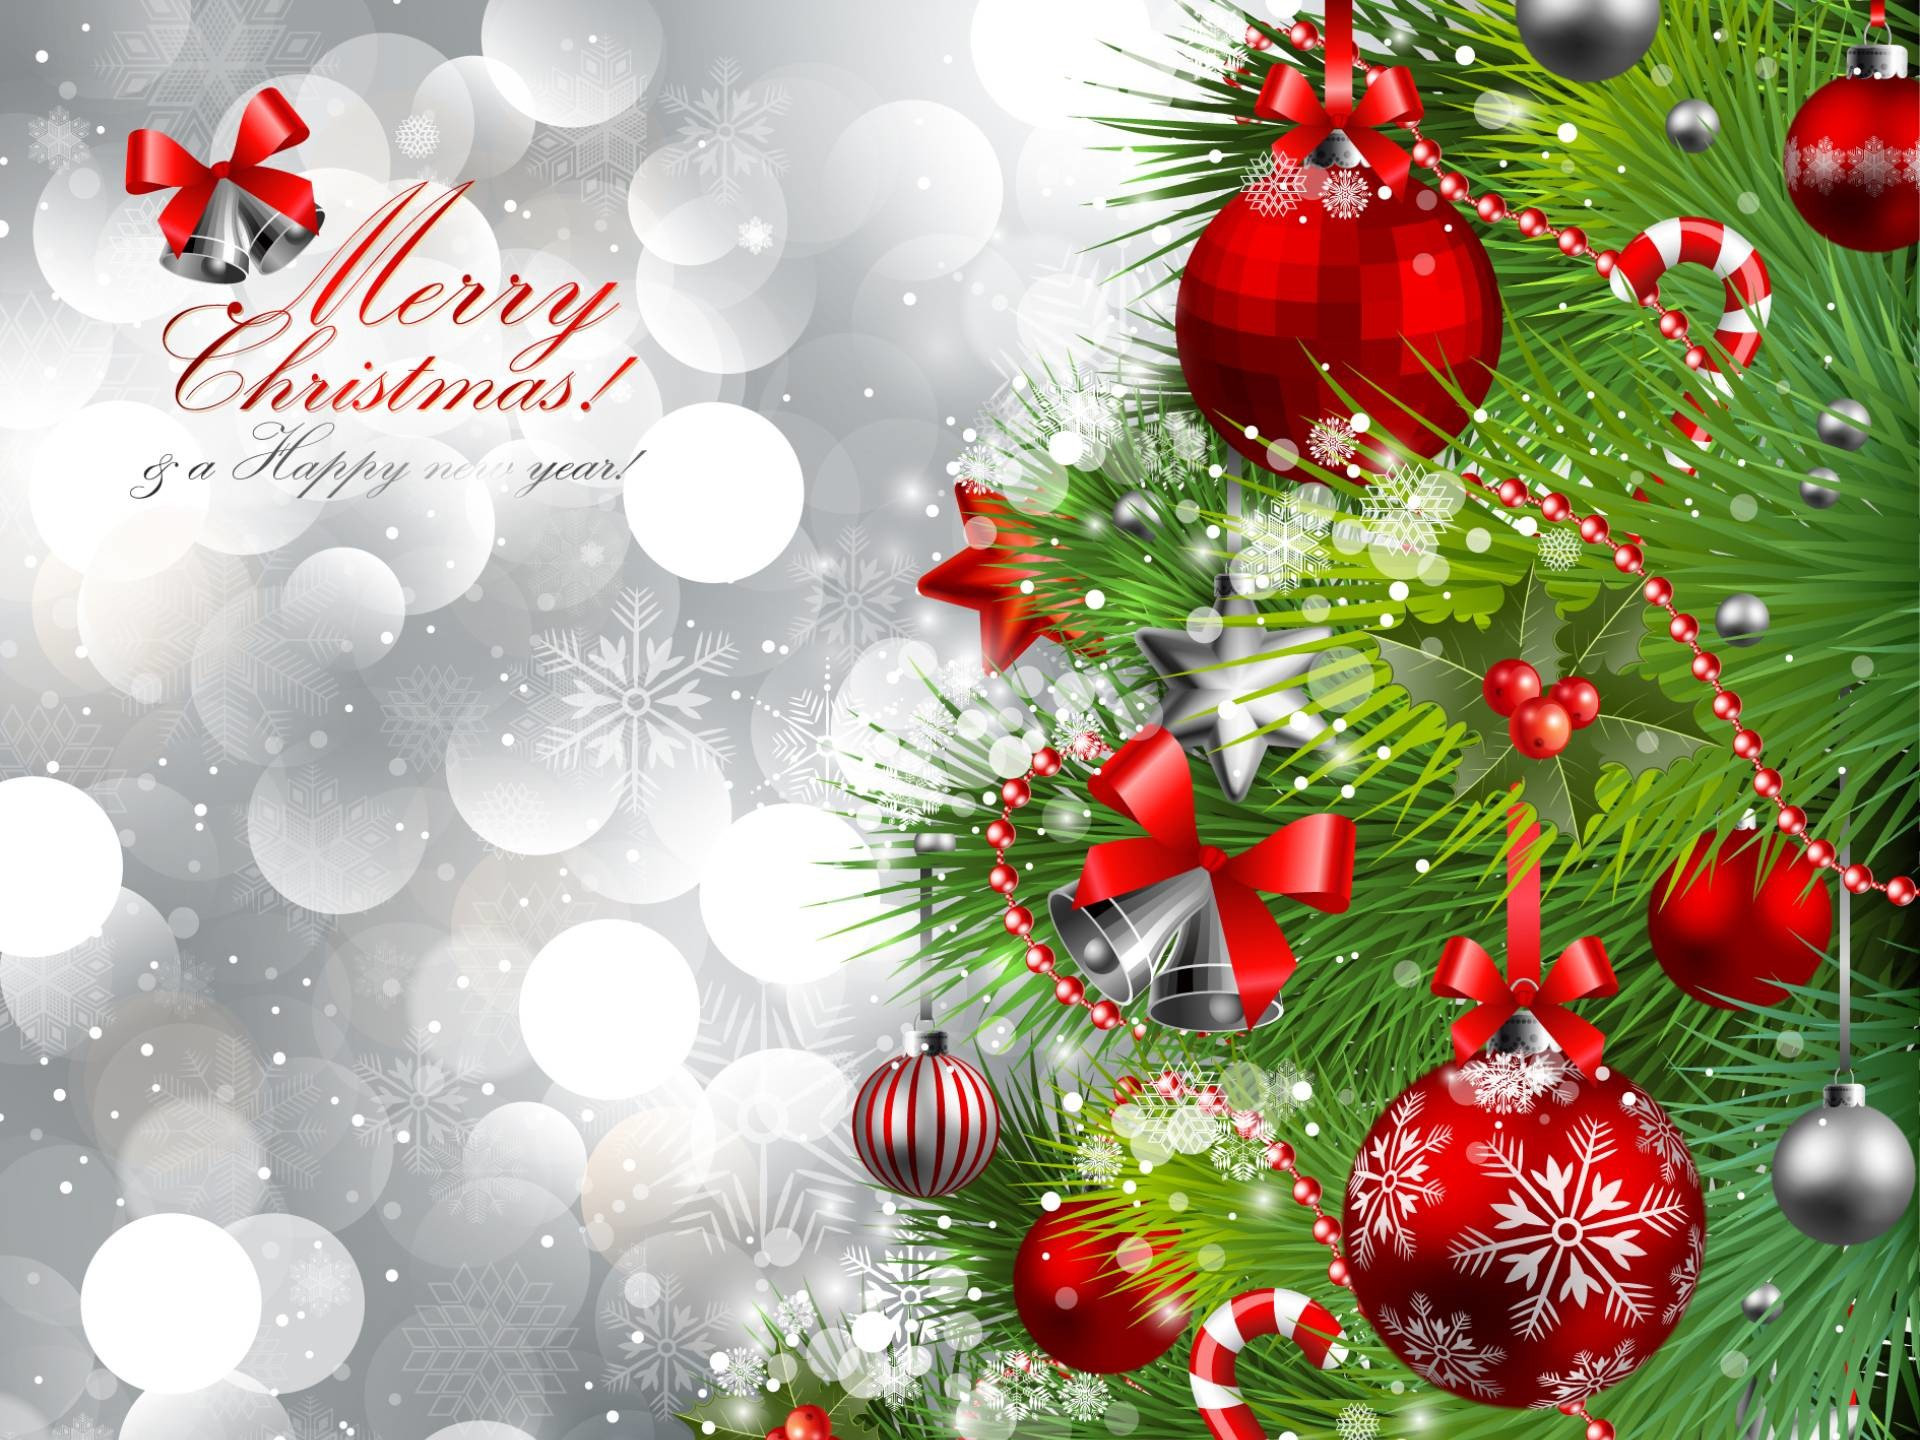 57 Images Of Merry Christmas Wallpaper On Wallpapersafari